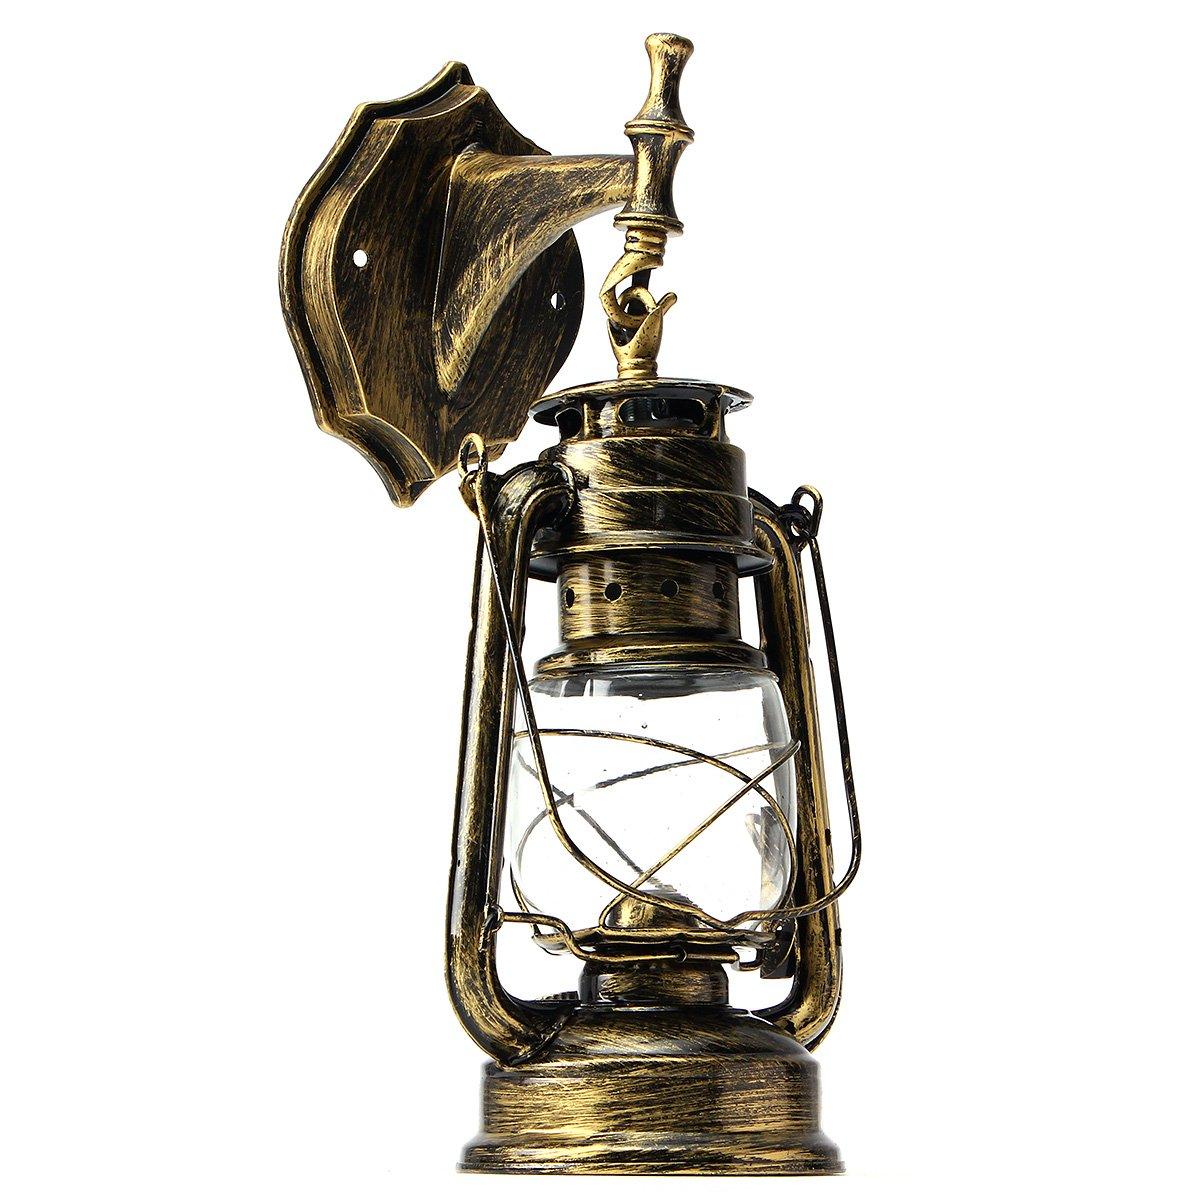 KING DO WAY Retro Rustikalen Laterne Lampe Wand Antiken Wandleuchter vintage lichtanlage outdoor e27 Bronze [Energieklasse A++] wosirlDE9278